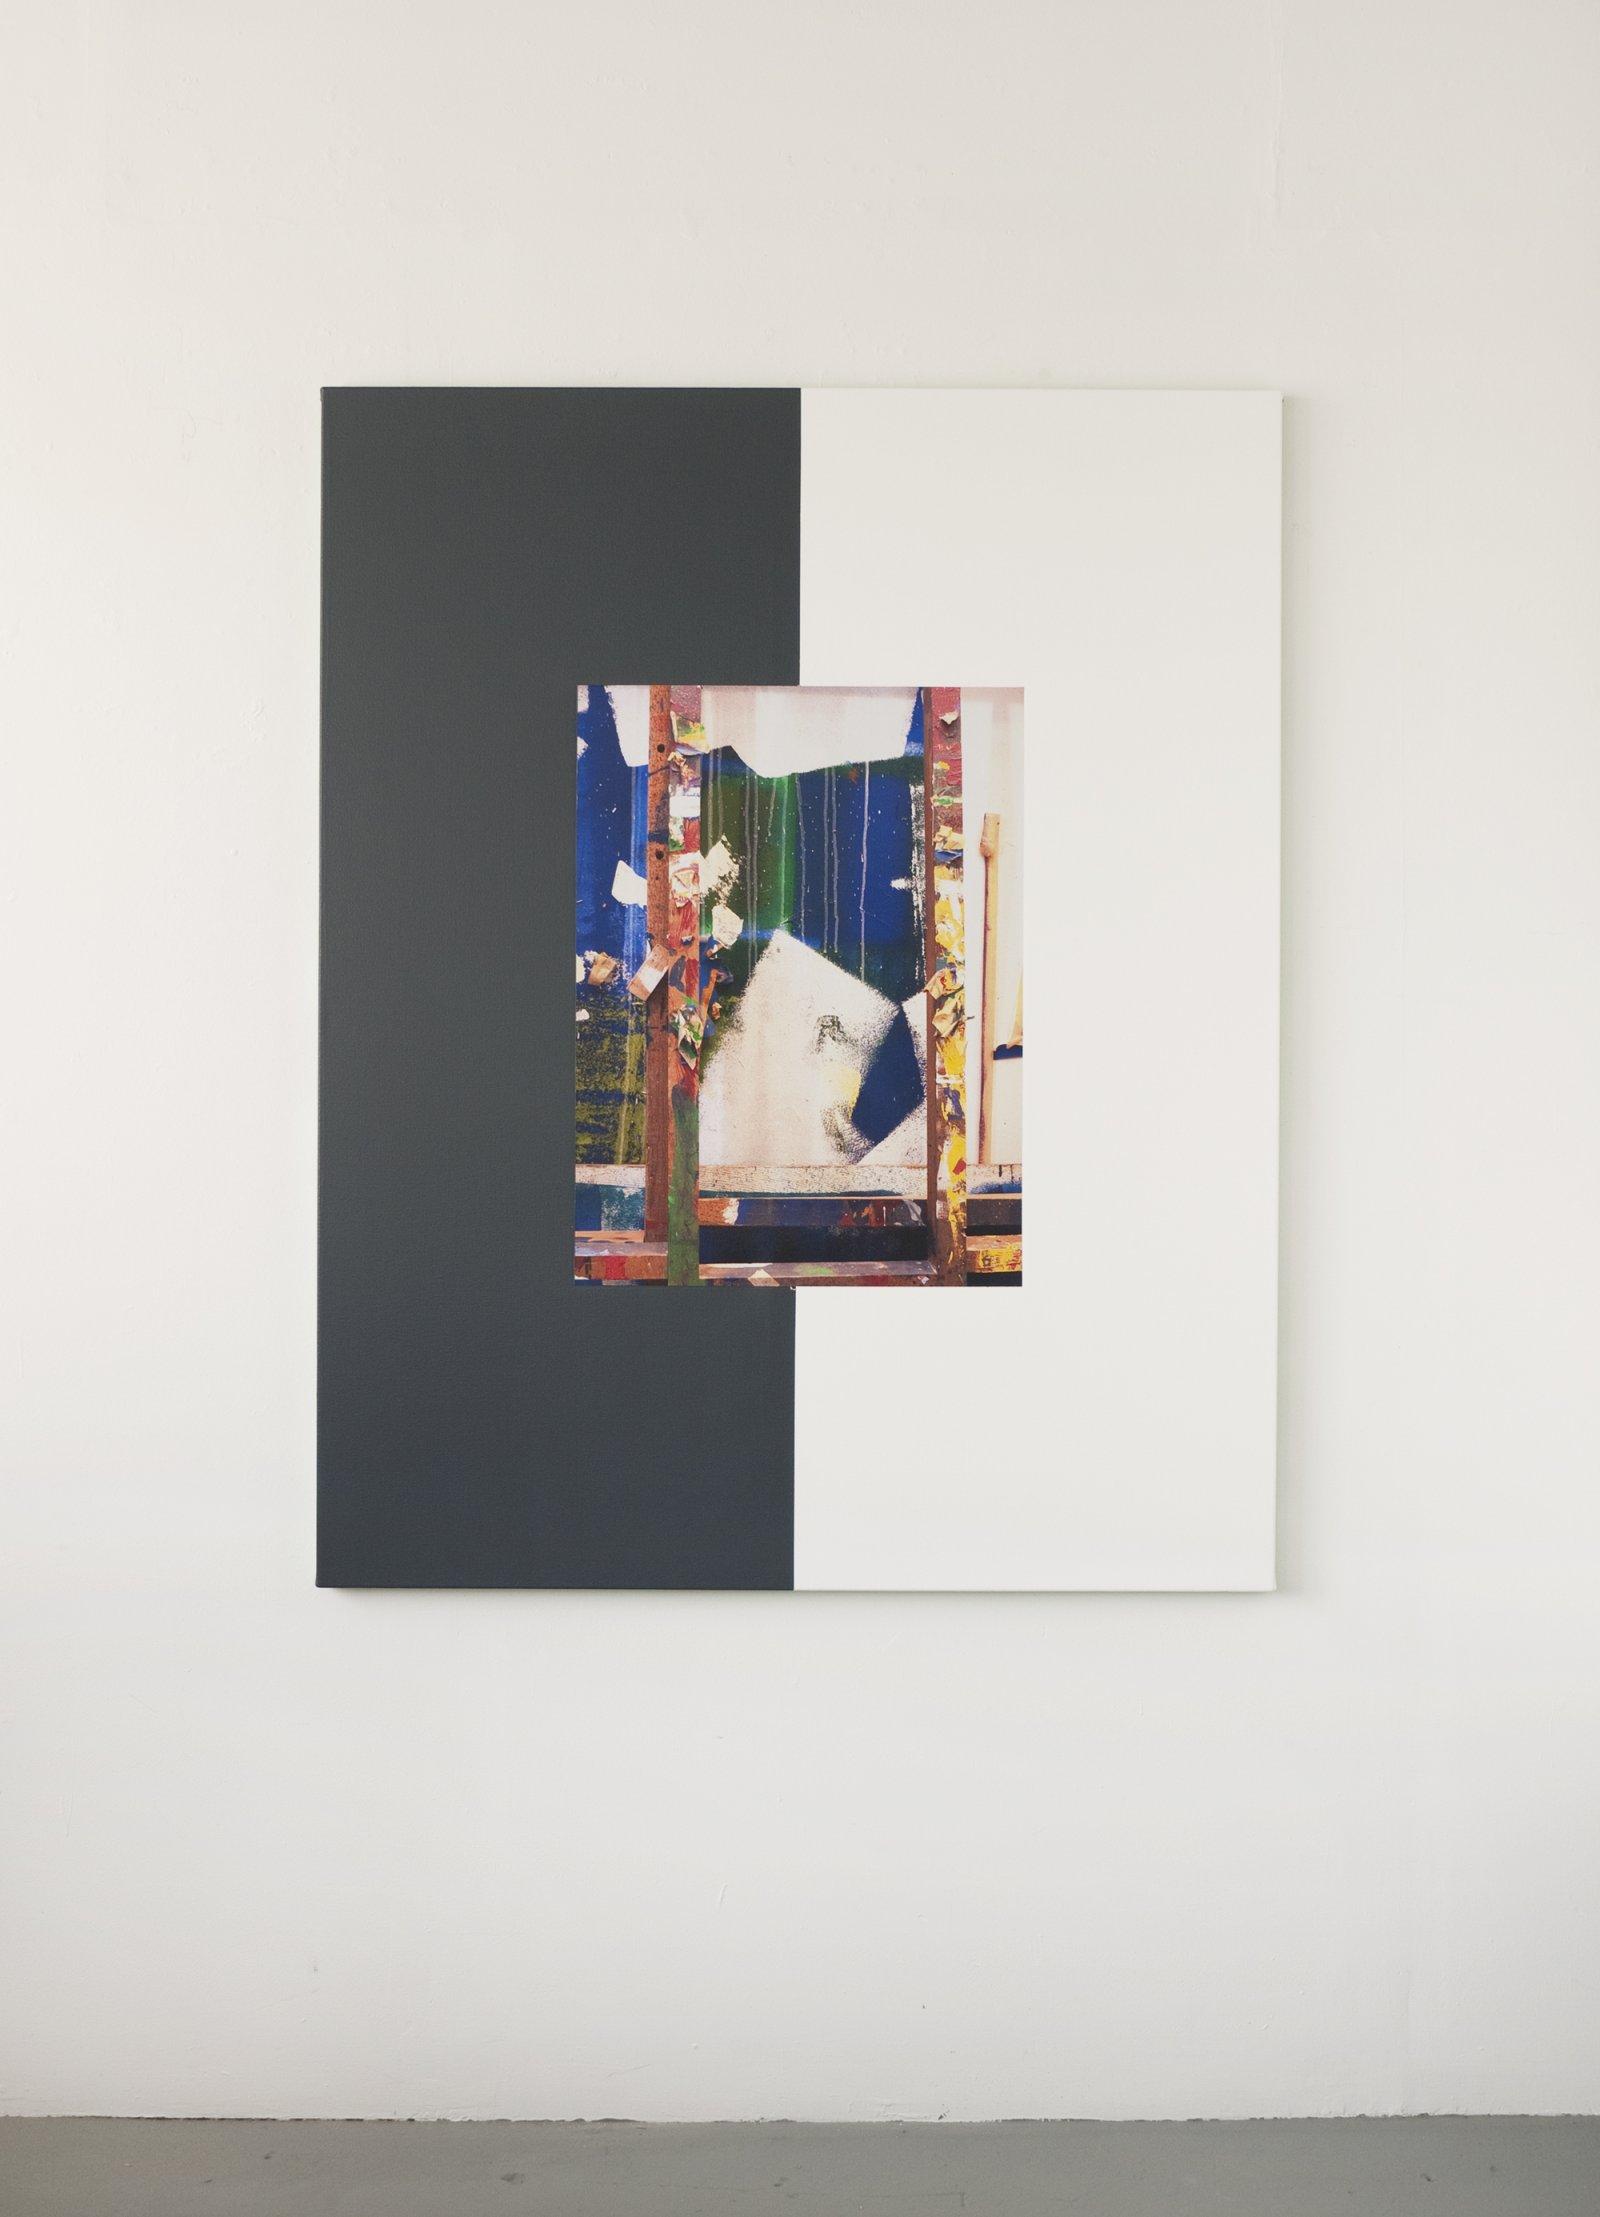 Ian Wallace,Les Traces de la Peinture (Molinari Series) IV, 2012,photolaminate and acrylic on canvas, 60 x 48 in. (152 x 122 cm)